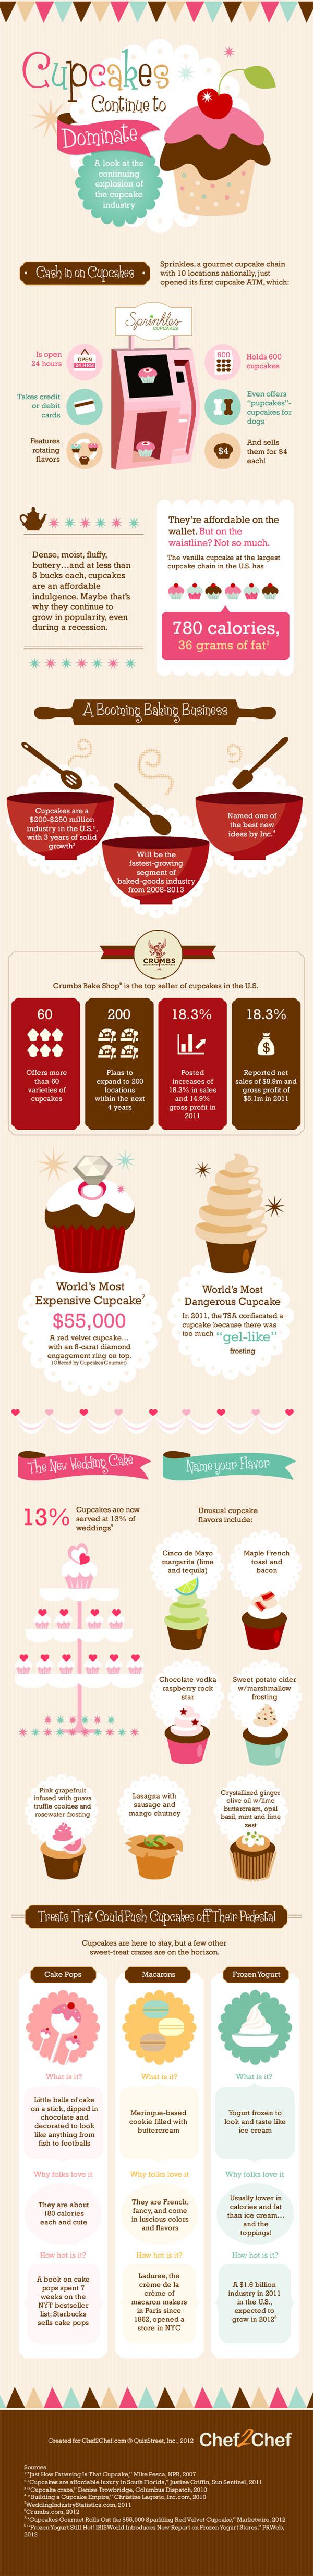 Cupcake Bakery Industry Statistics